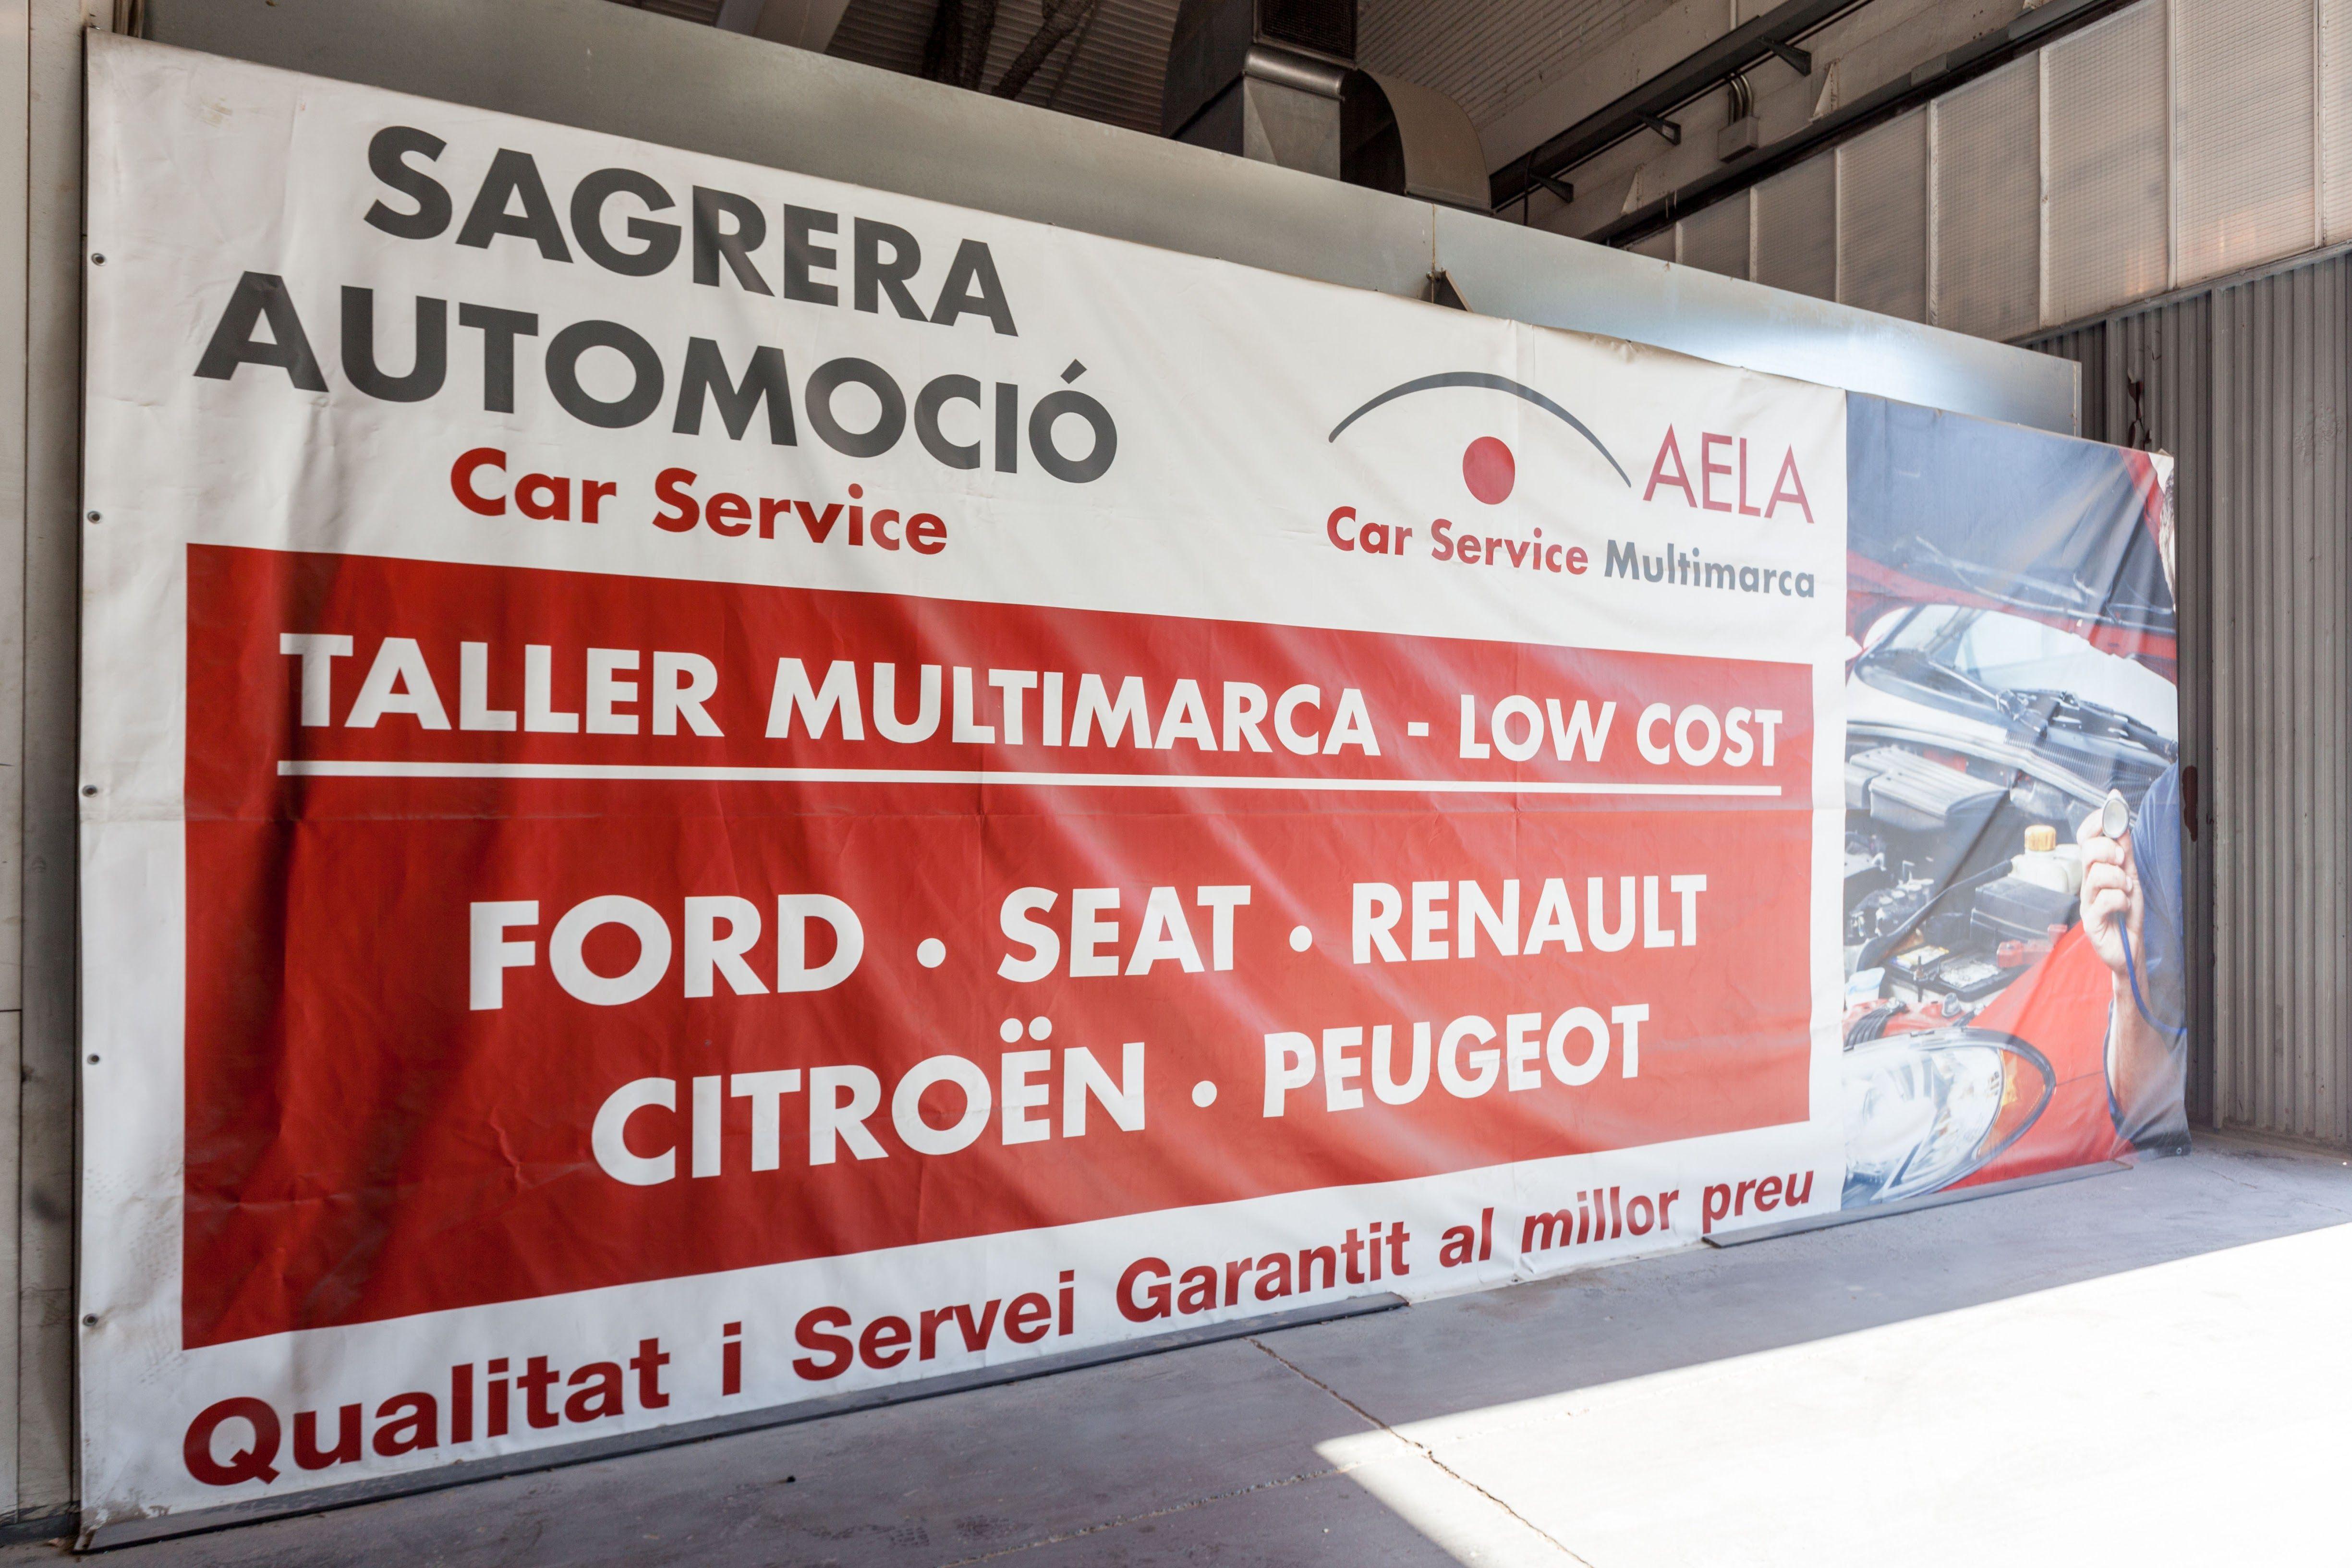 Foto 2 de Talleres de automóviles en Barcelona | Sagrera Automoció